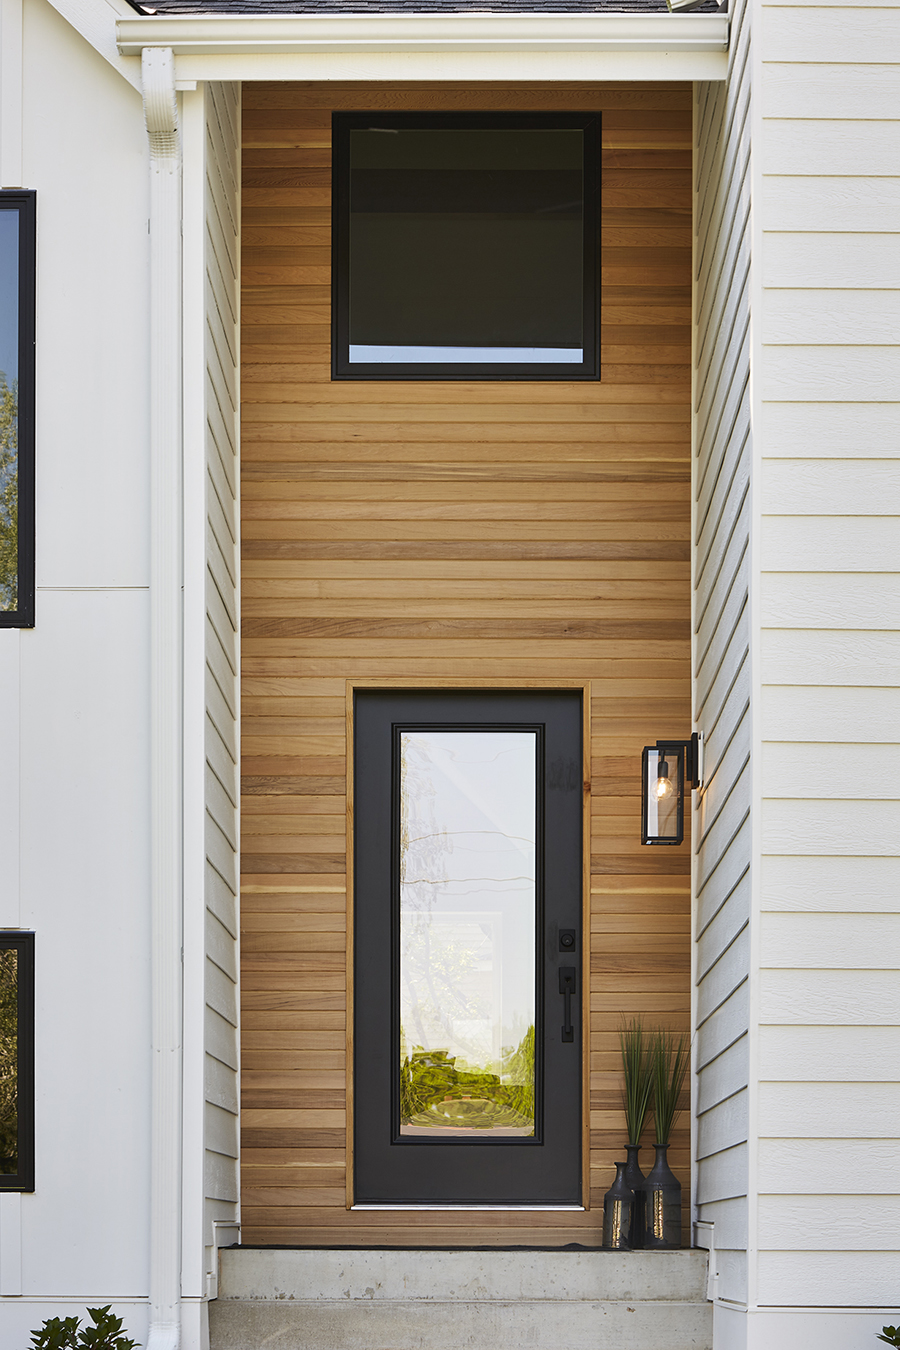 Str8 Modern Real Estate Home Design Golden Valley MN Build Builder Minnesota Realtor Renovate Remodel Interior Minneapolis2.jpg